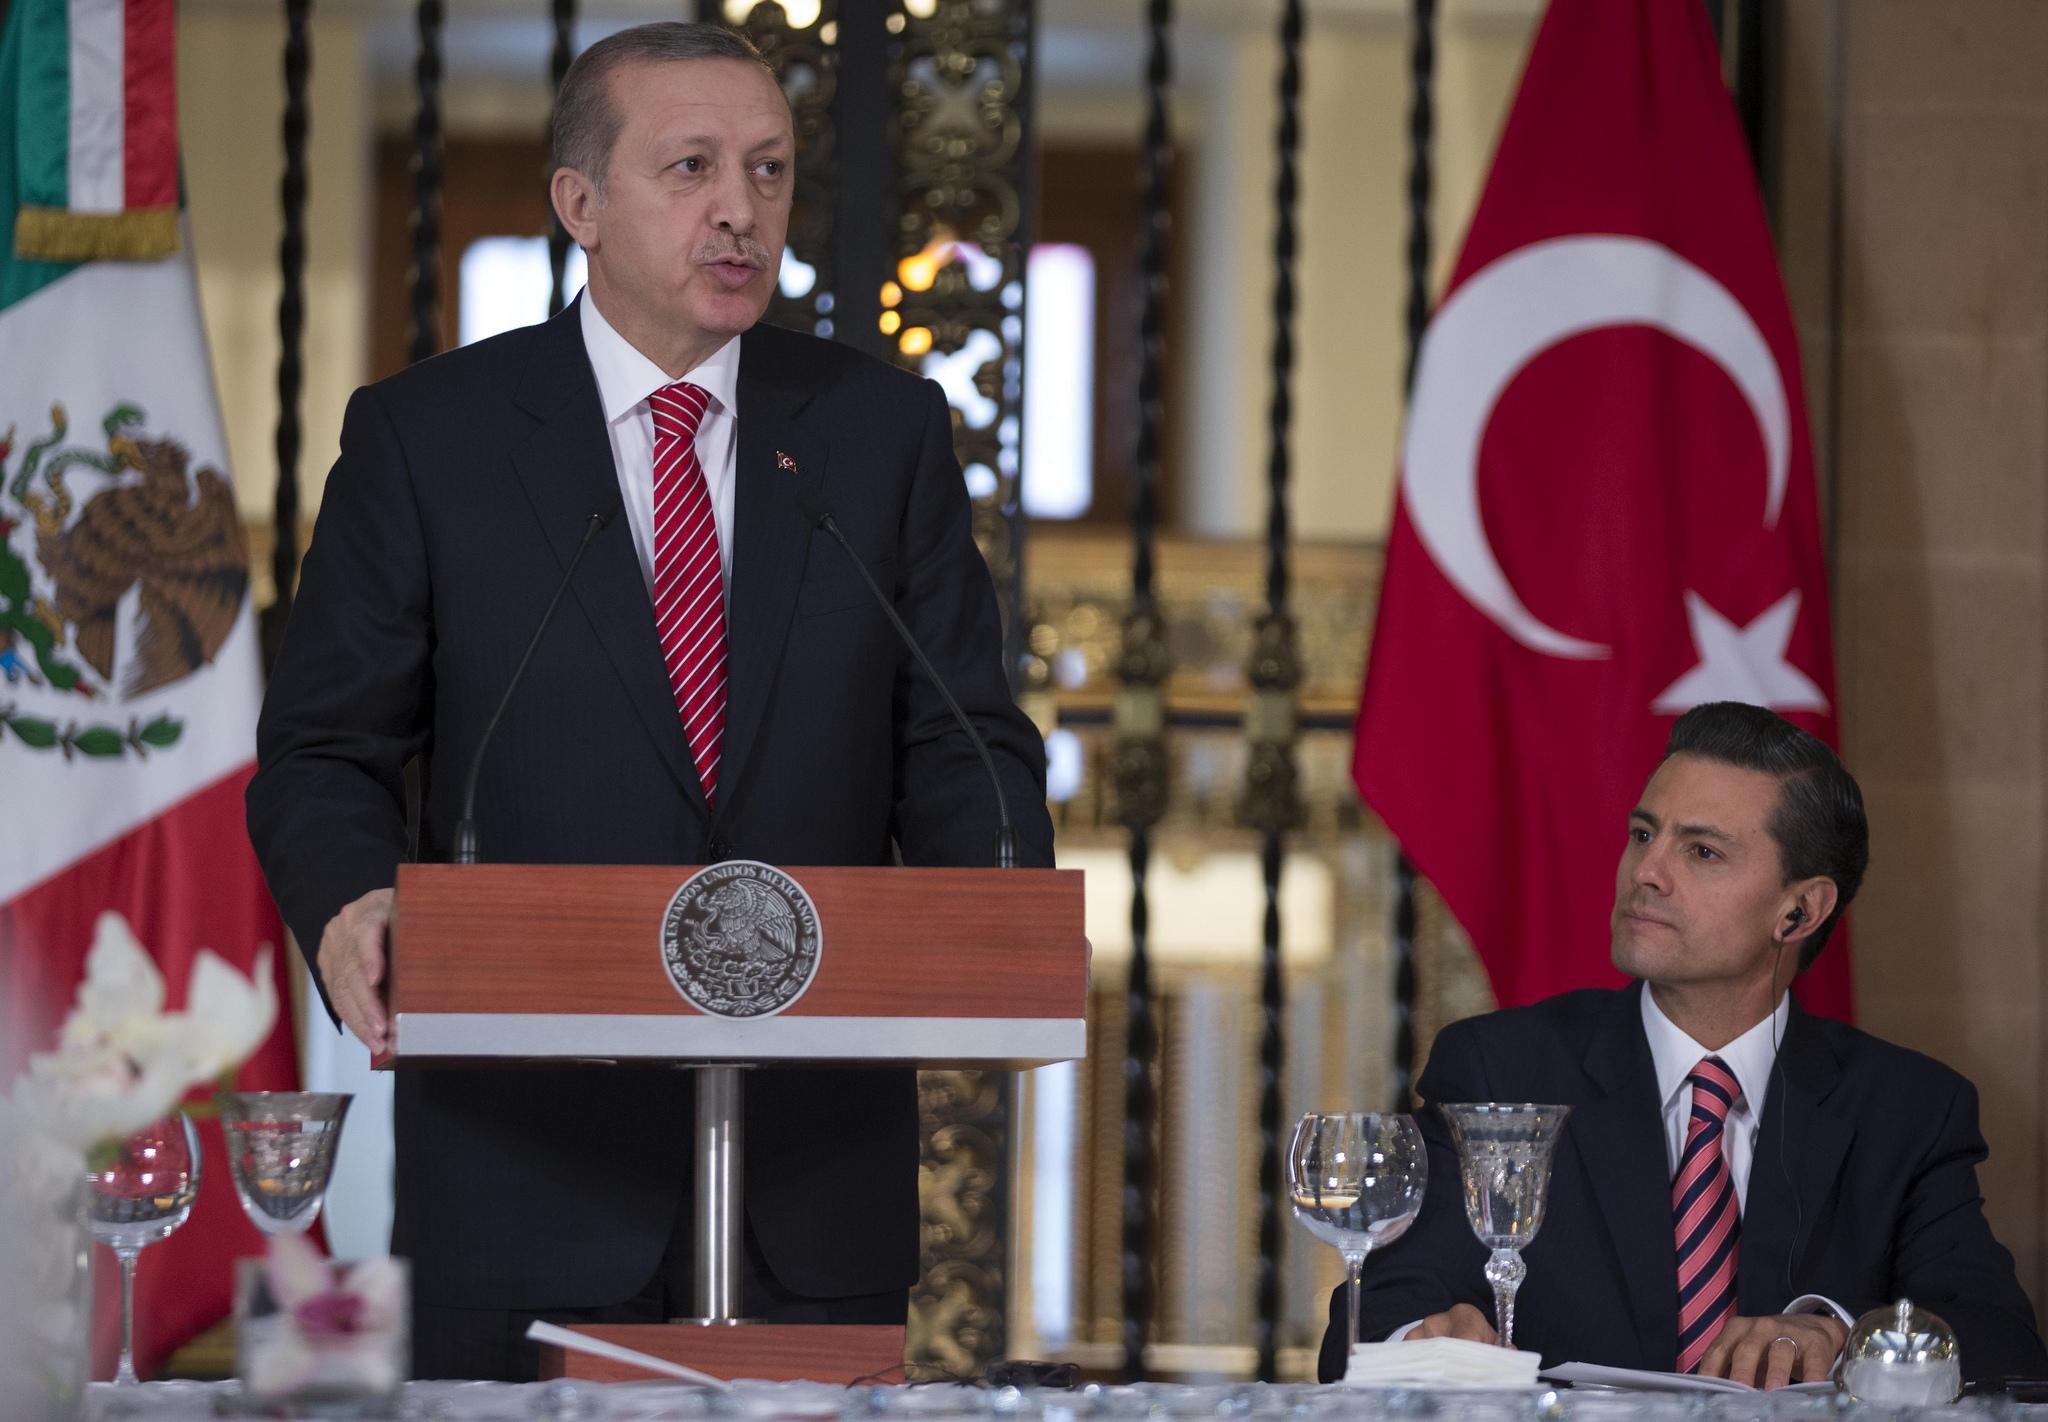 Turkish President Erdogan meeting with Mexican President Enrique Peña Nieto. Photo courtesy of Flickr.